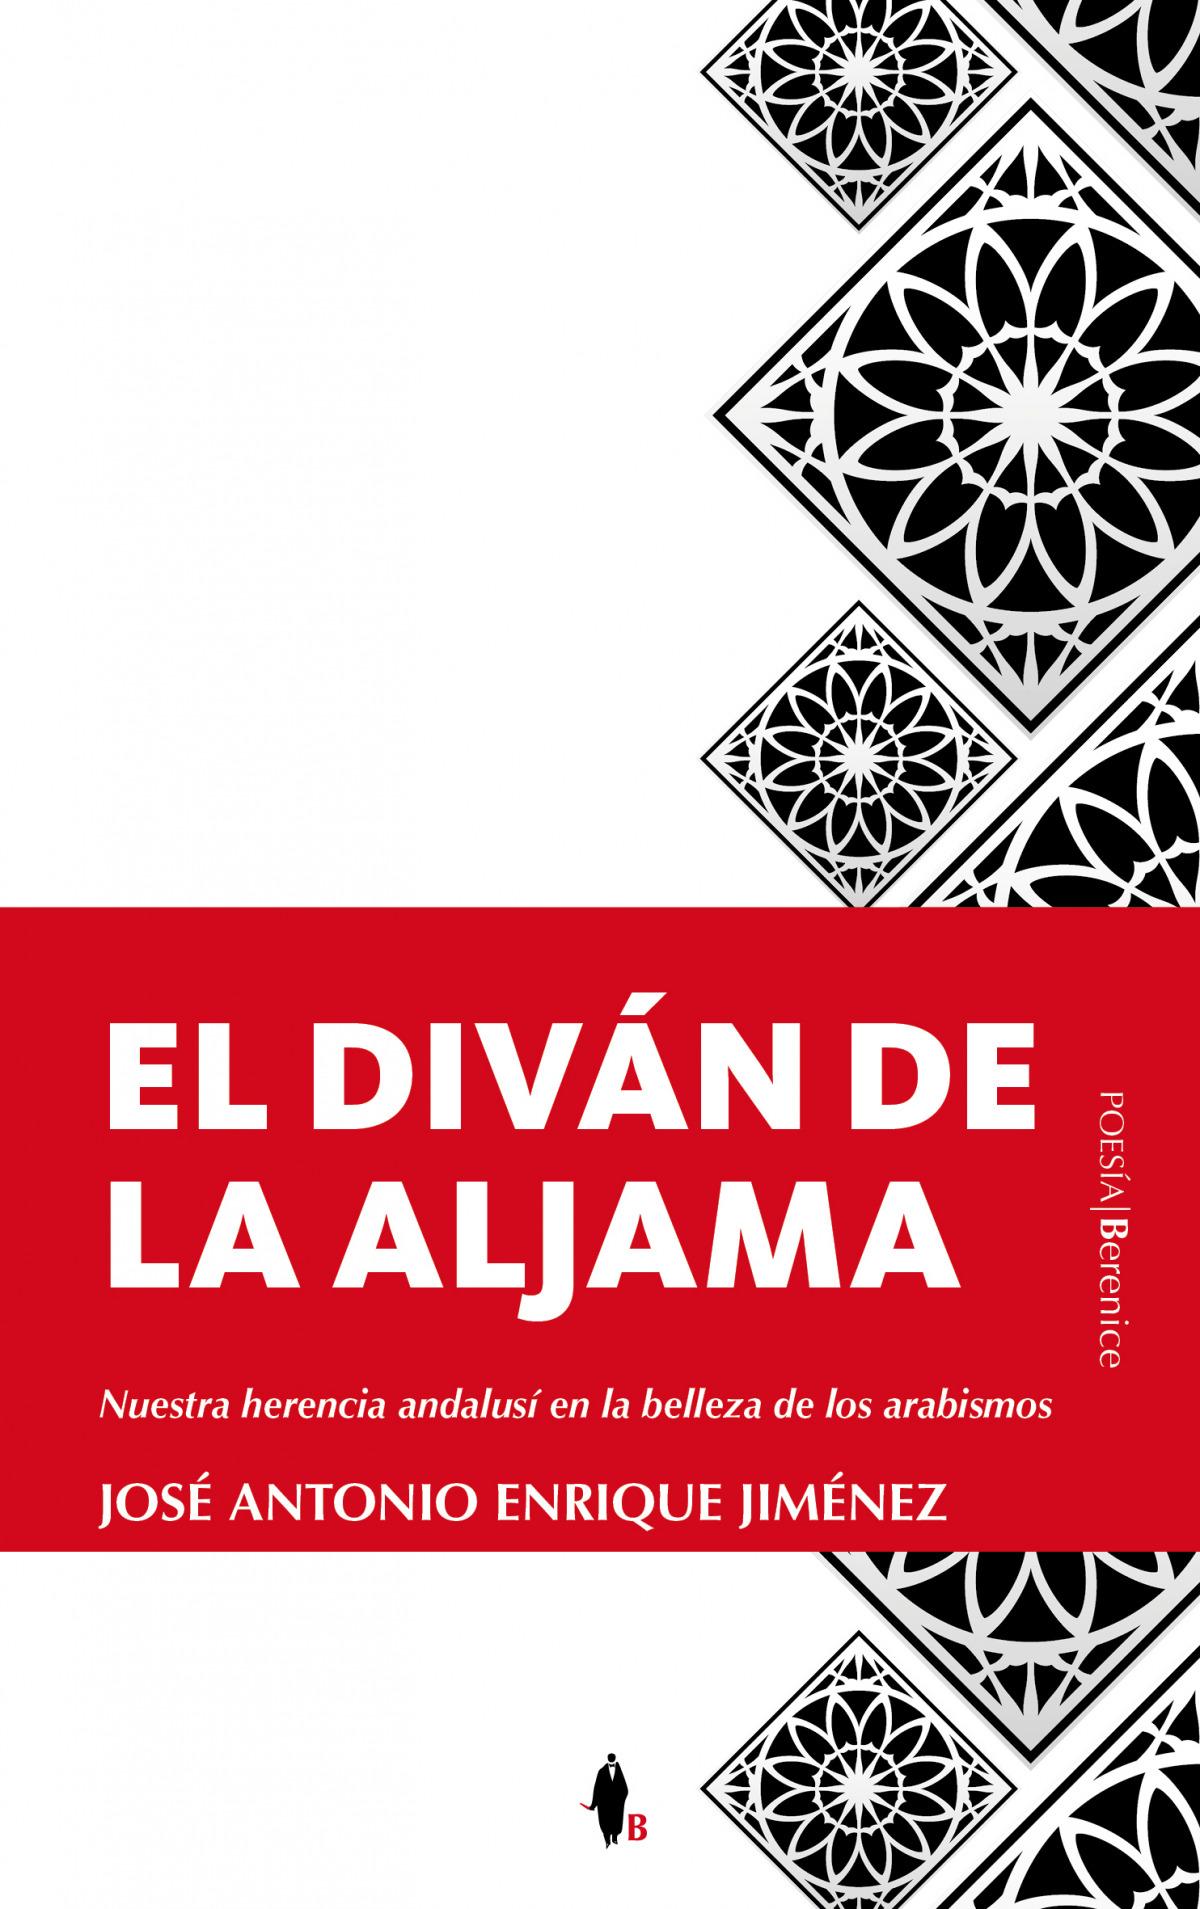 El diván de la Aljama